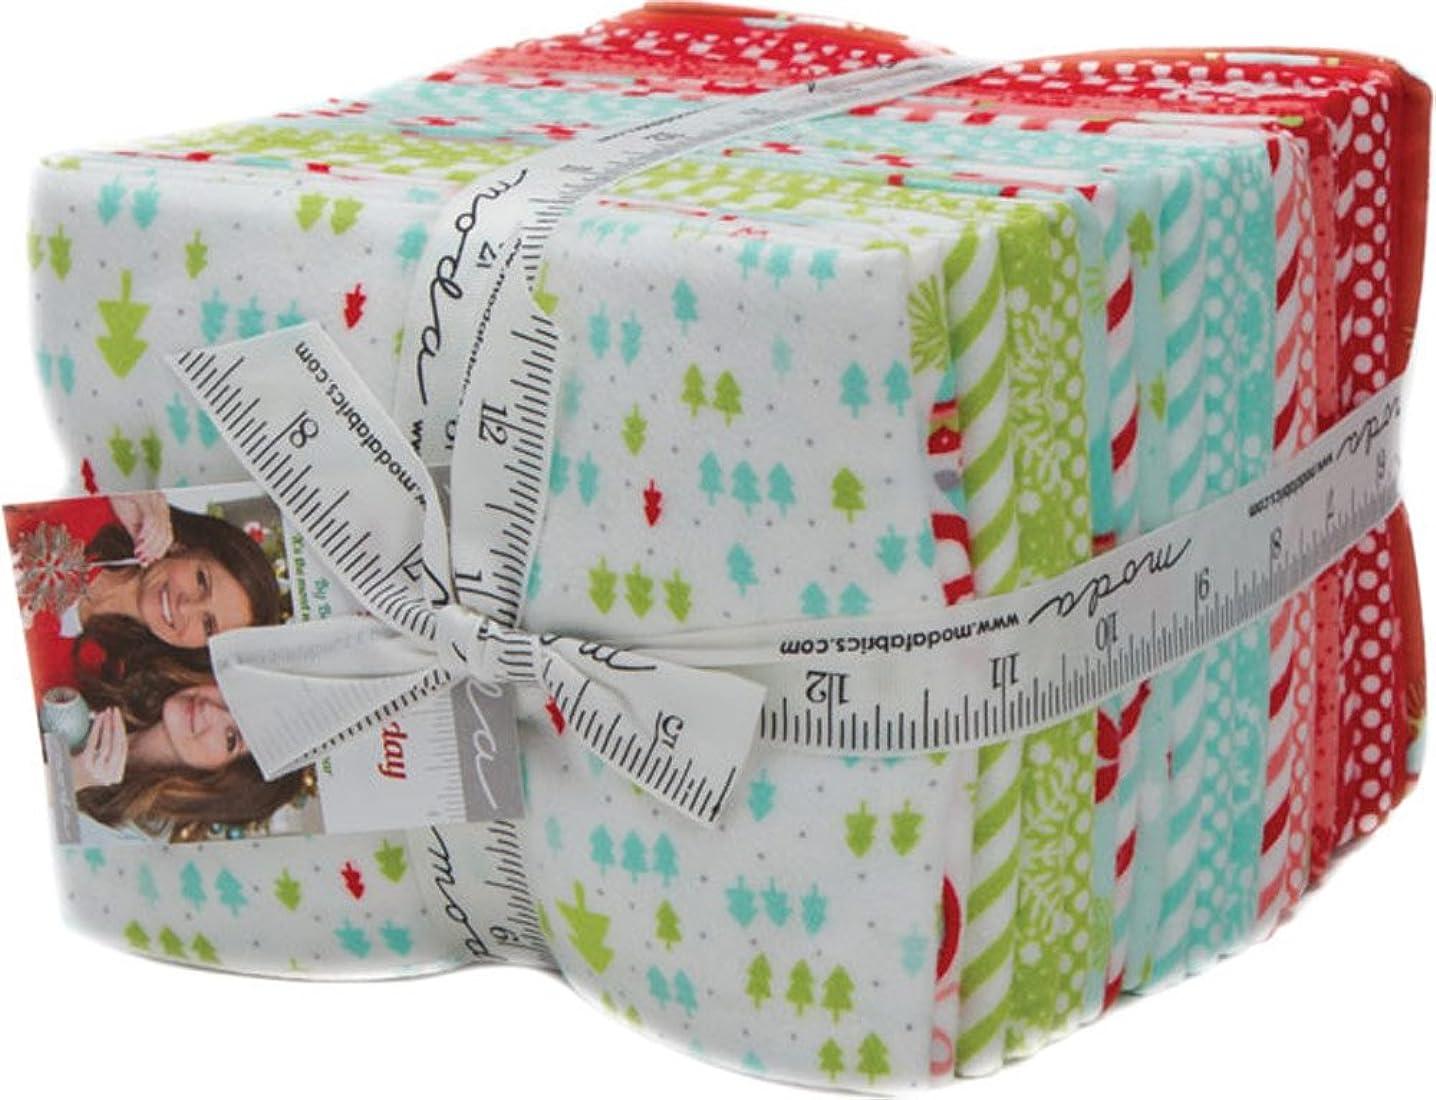 Vintage Holiday Flannel Fat Quarter Bundle 20 Precut Cotton Fabric Assortment by Bonnie & Camille for Moda 55160ABF